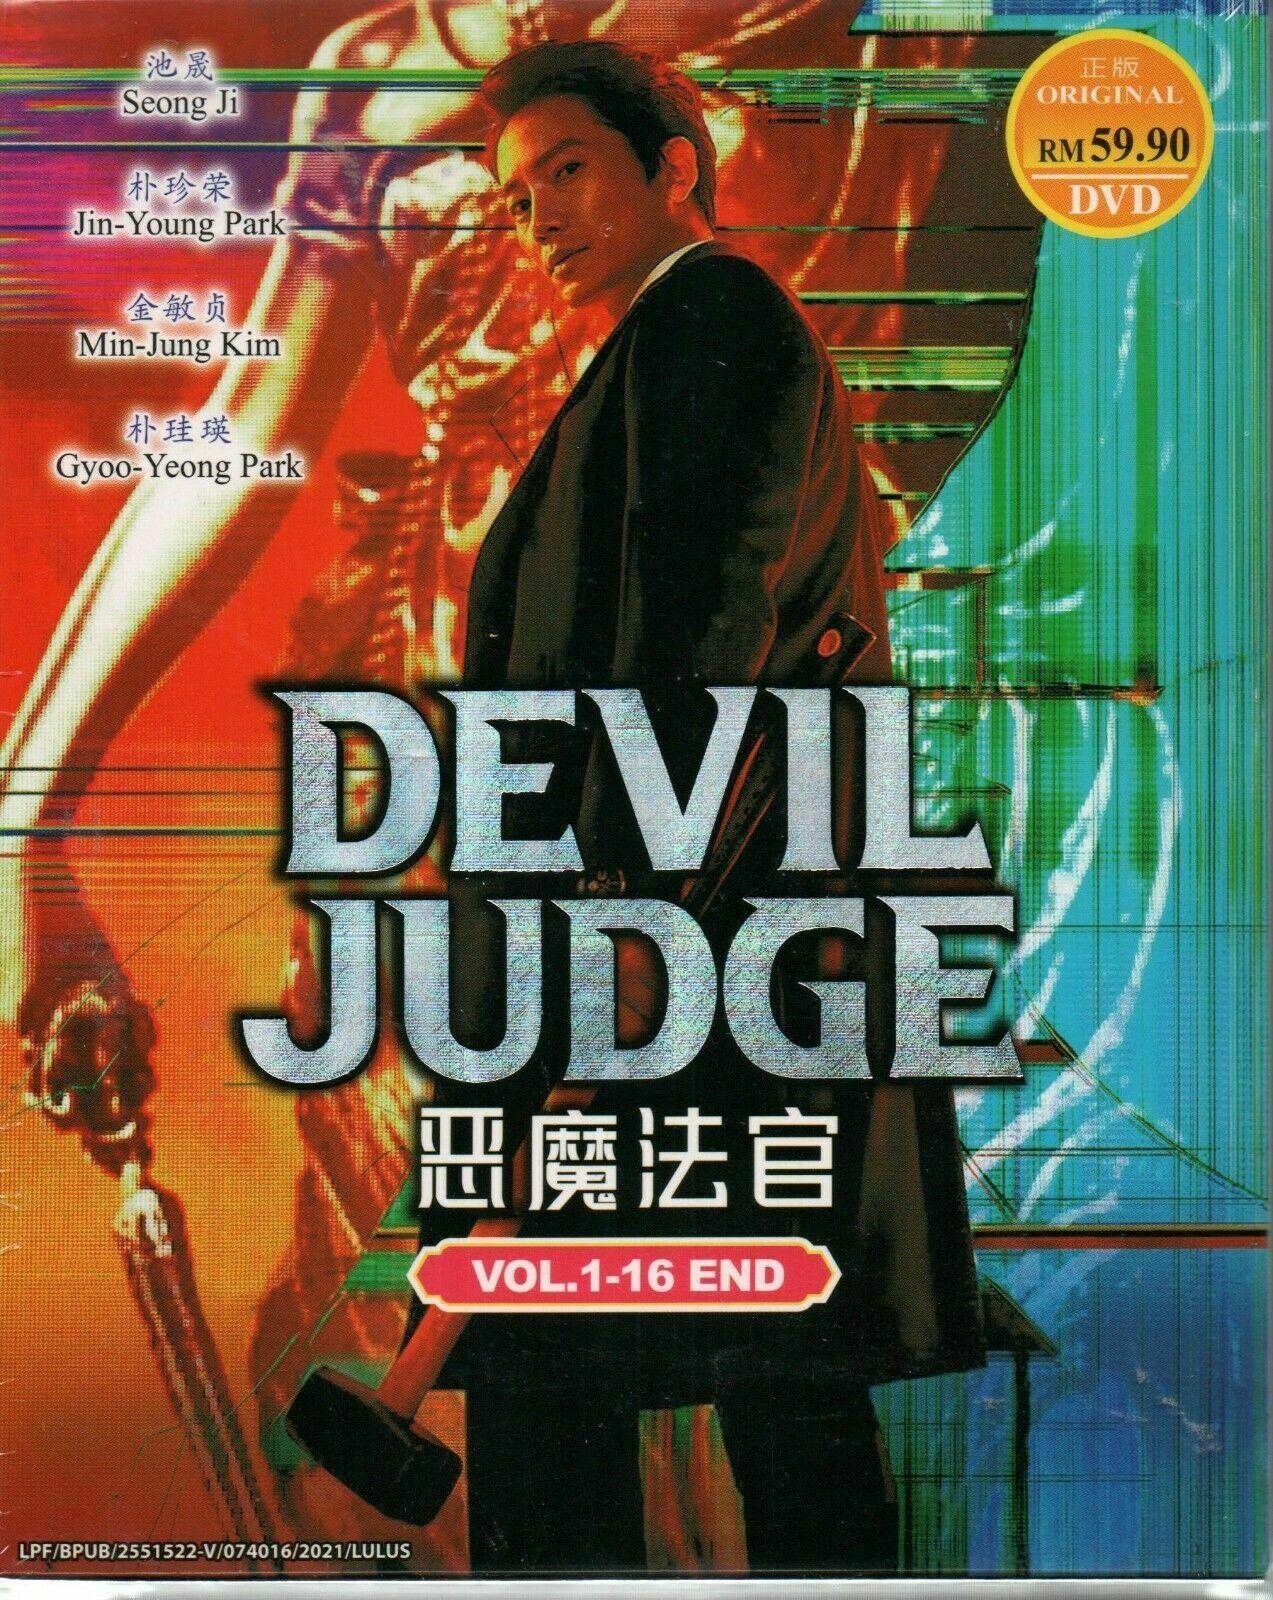 Korean Drama DVD The Devil Judge Vol.1-16 End 2021 English Subtitle Ship From US